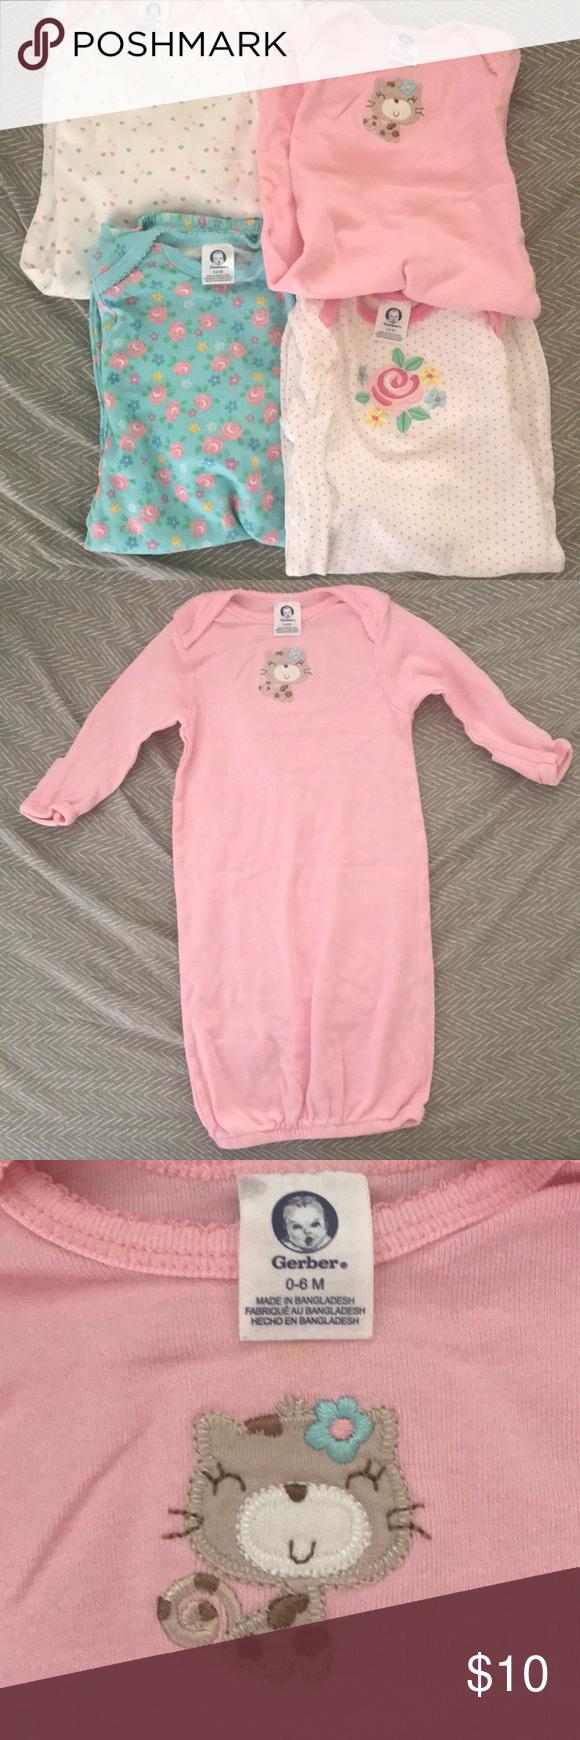 Gerber Baby Gown 4 Pack | My Posh Closet | Pinterest | Gerber baby ...